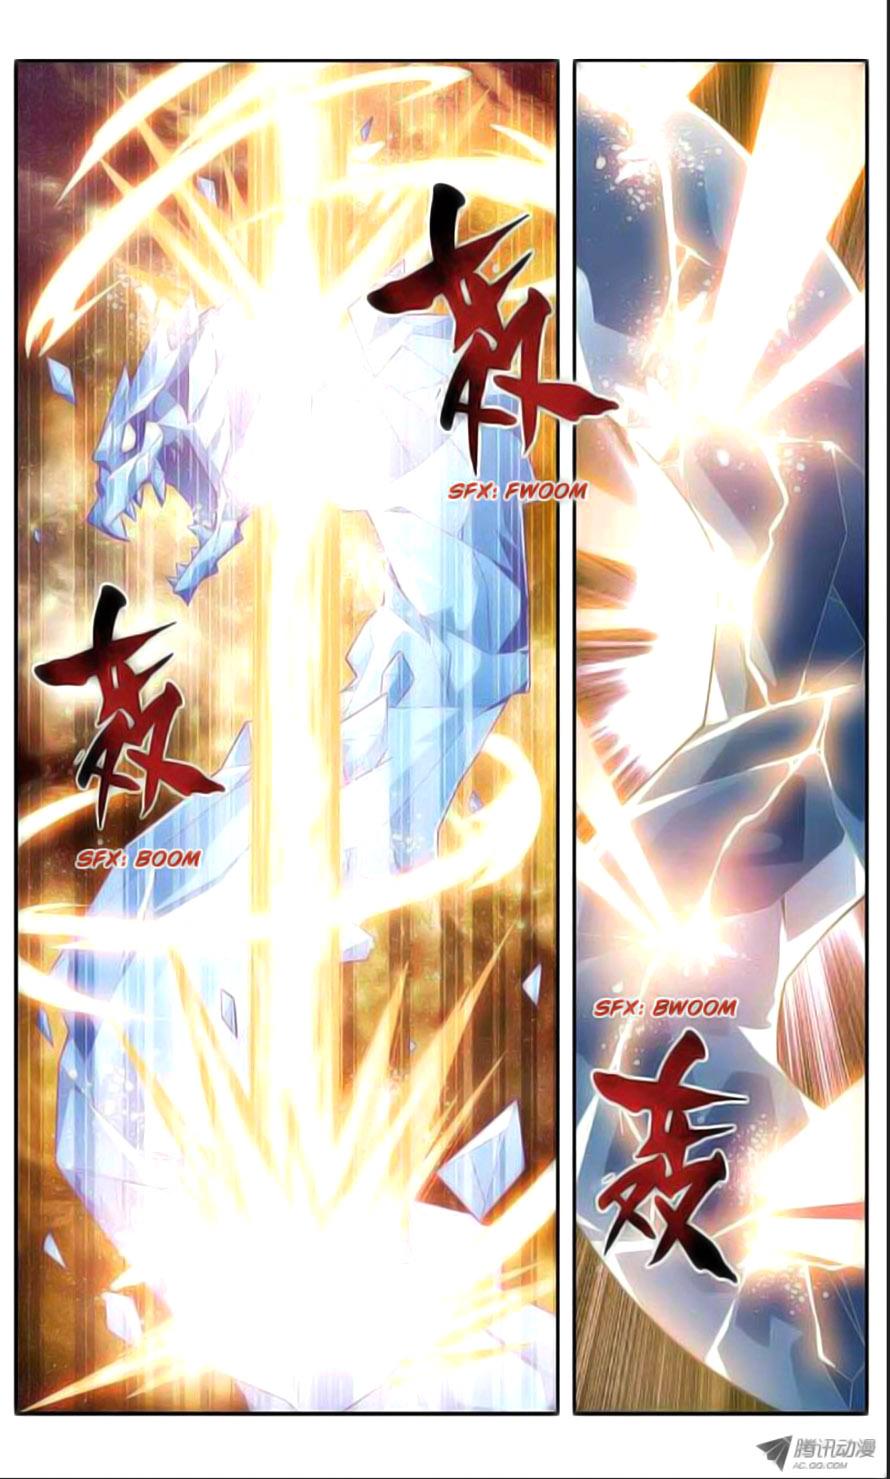 Dilarang COPAS - situs resmi www.mangacanblog.com - Komik battle through heaven 022 - chapter 22 23 Indonesia battle through heaven 022 - chapter 22 Terbaru 7|Baca Manga Komik Indonesia|Mangacan